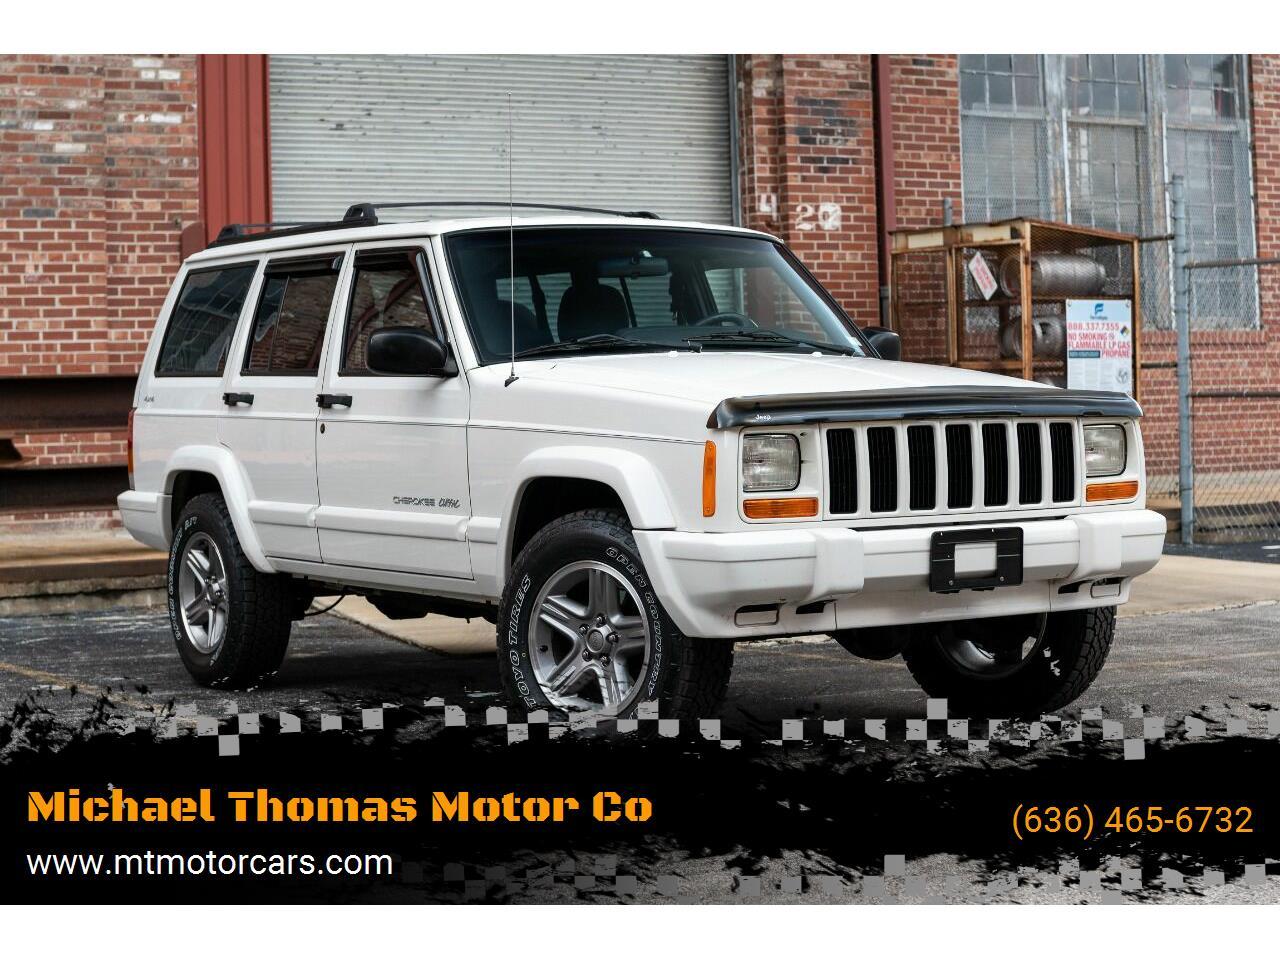 2000 Jeep Cherokee (CC-1429748) for sale in Saint Charles, Missouri